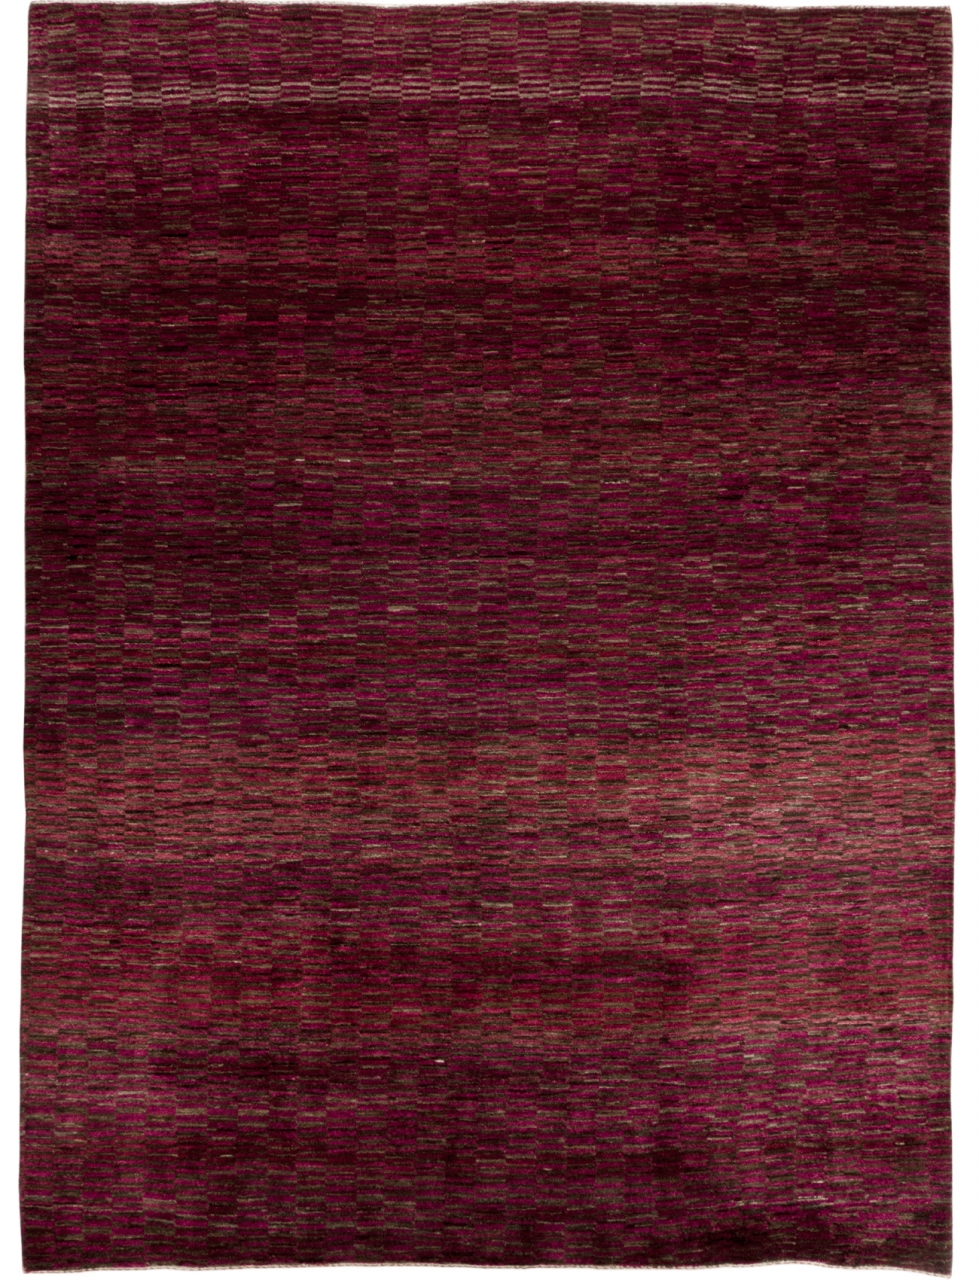 Iran Gabbeh Teppich-Unikat Lavendelfeld